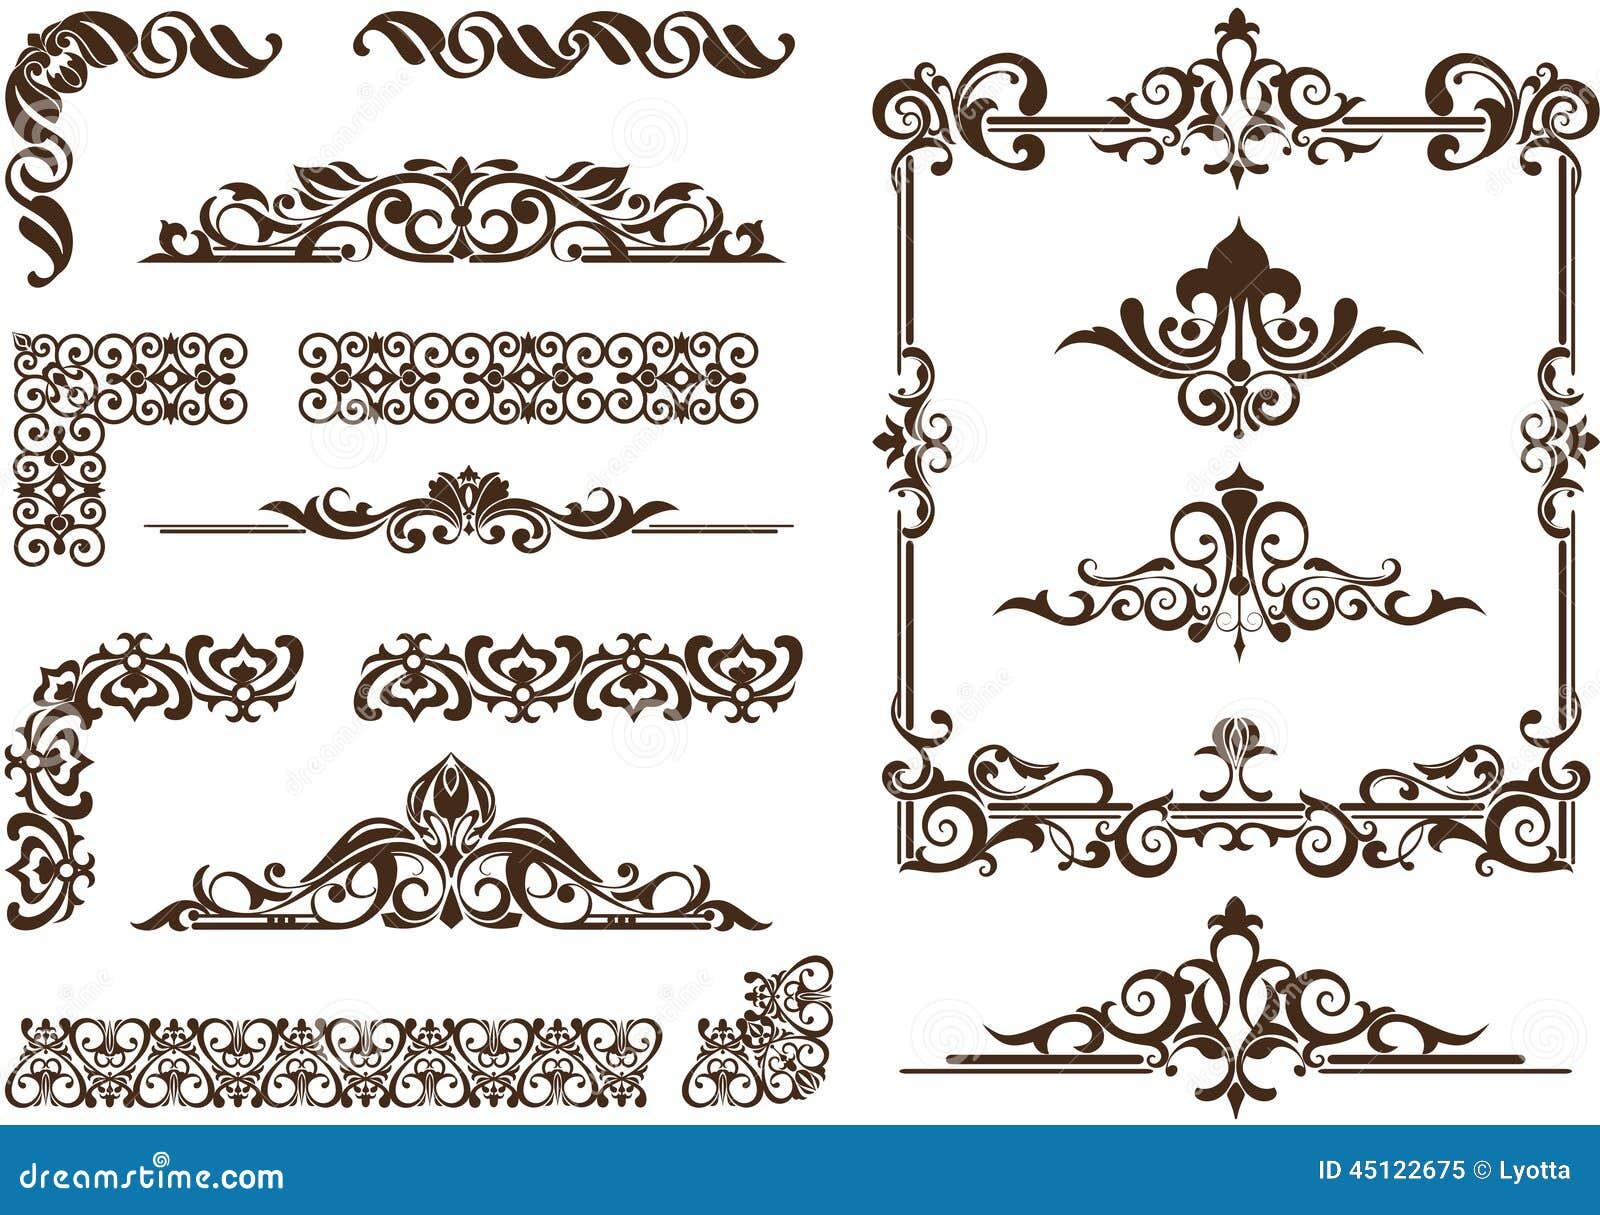 Vector Ornaments Frames, Corners, Borders Stock Vector - Image: 45122675